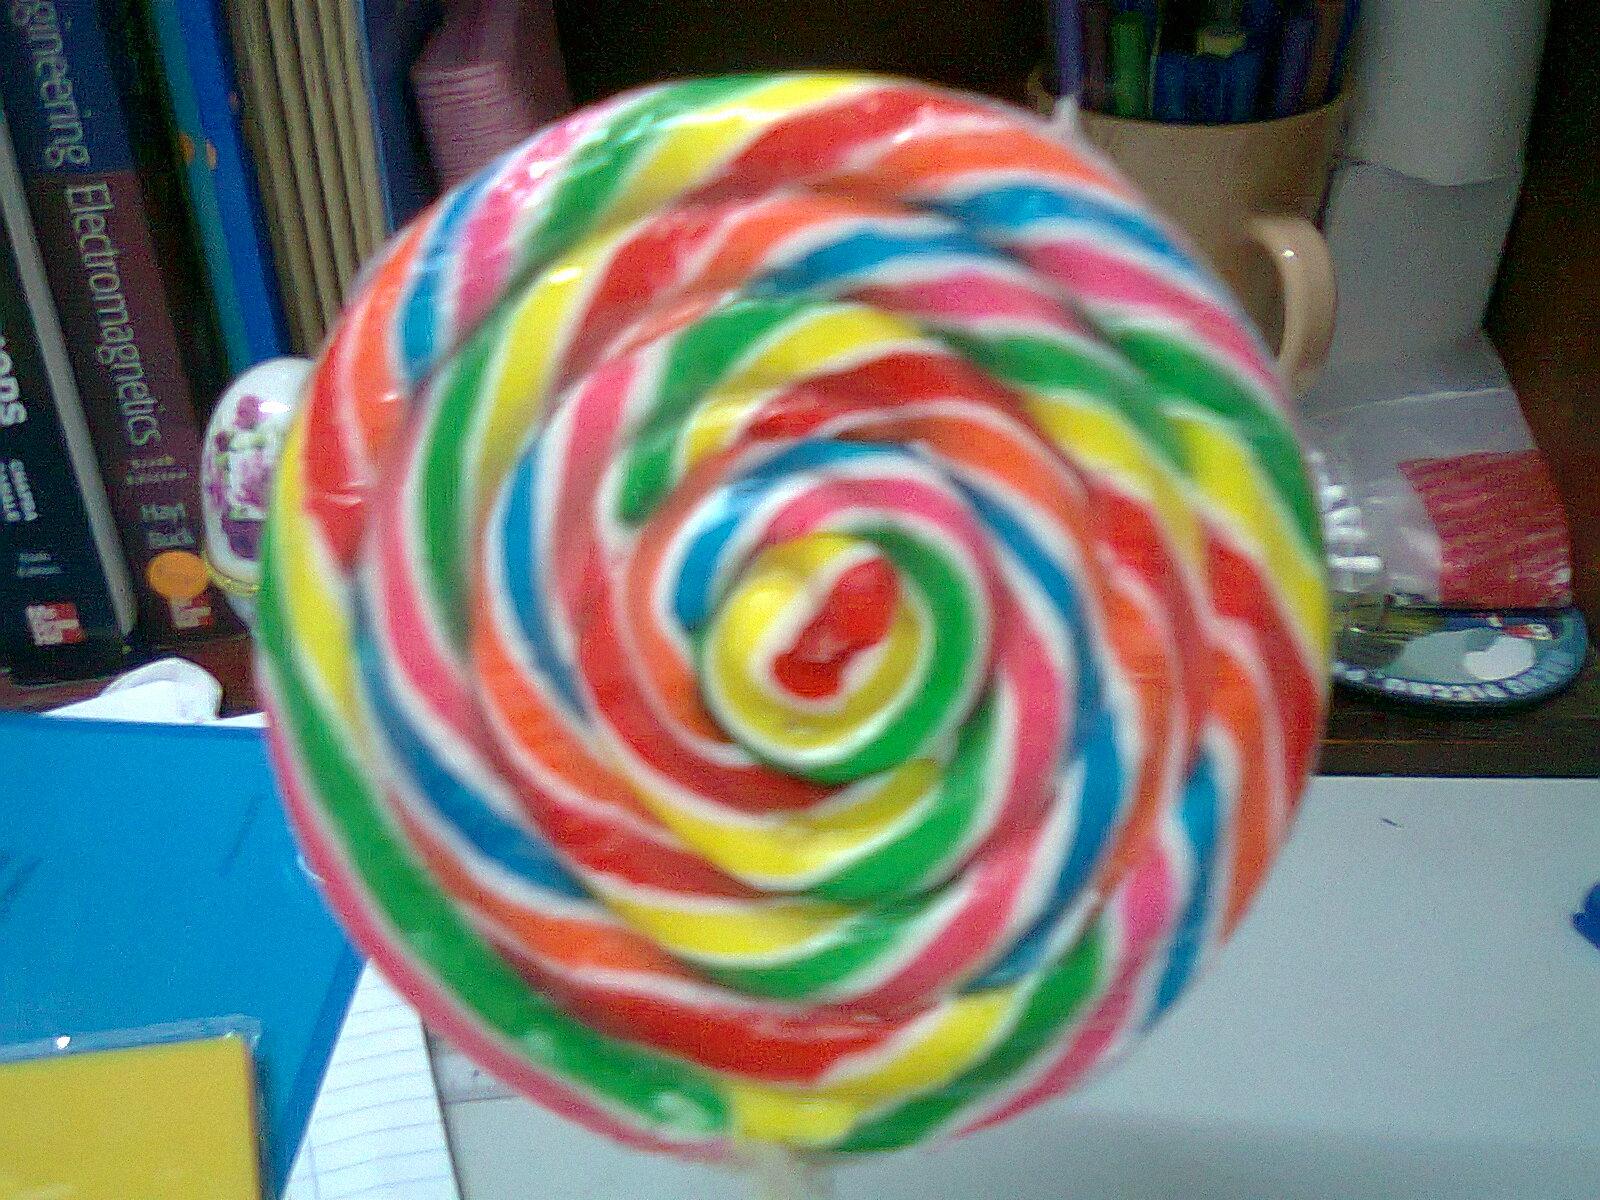 Awak tgk la lollipop ni.mase cuti sem ai tu sy cakap dengan mr.P yg saya  nak lollipop besar kepala.mase tu sy saje2 je.ape2 yg terlintas kat kepala  sy,sume